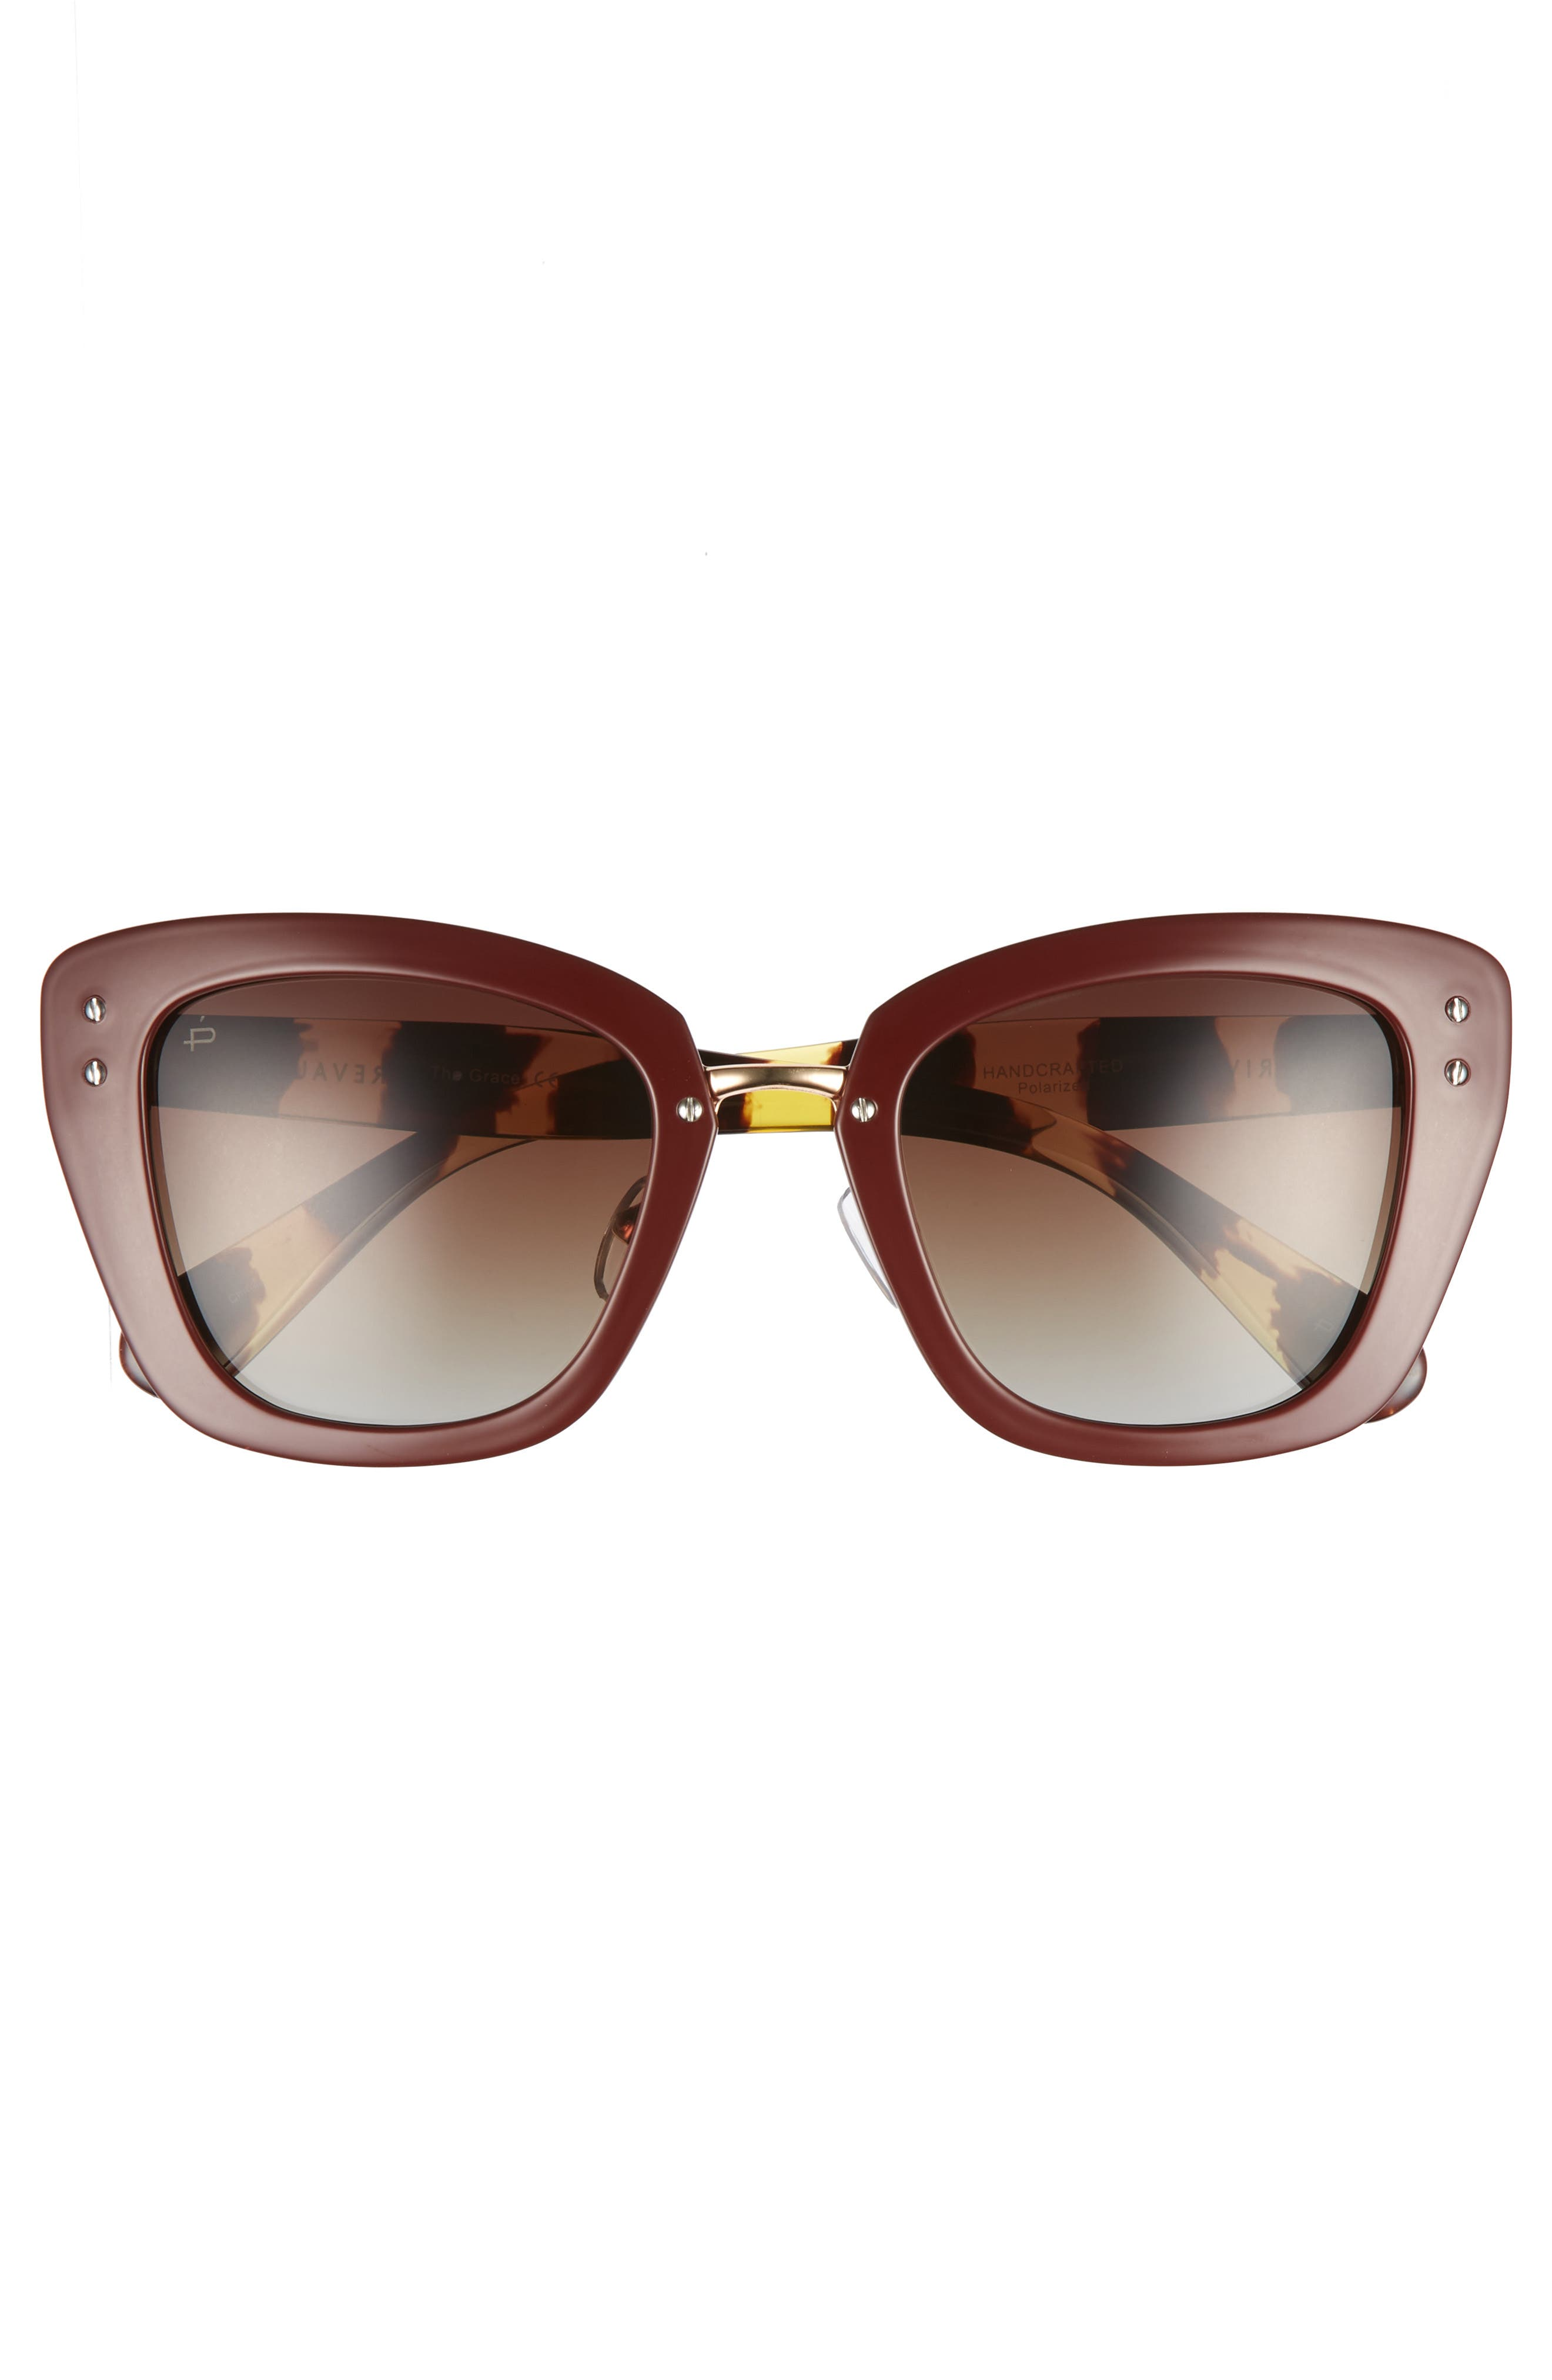 Privé Revaux The Grace 52mm Cat Eye Sunglasses,                             Alternate thumbnail 3, color,                             RED